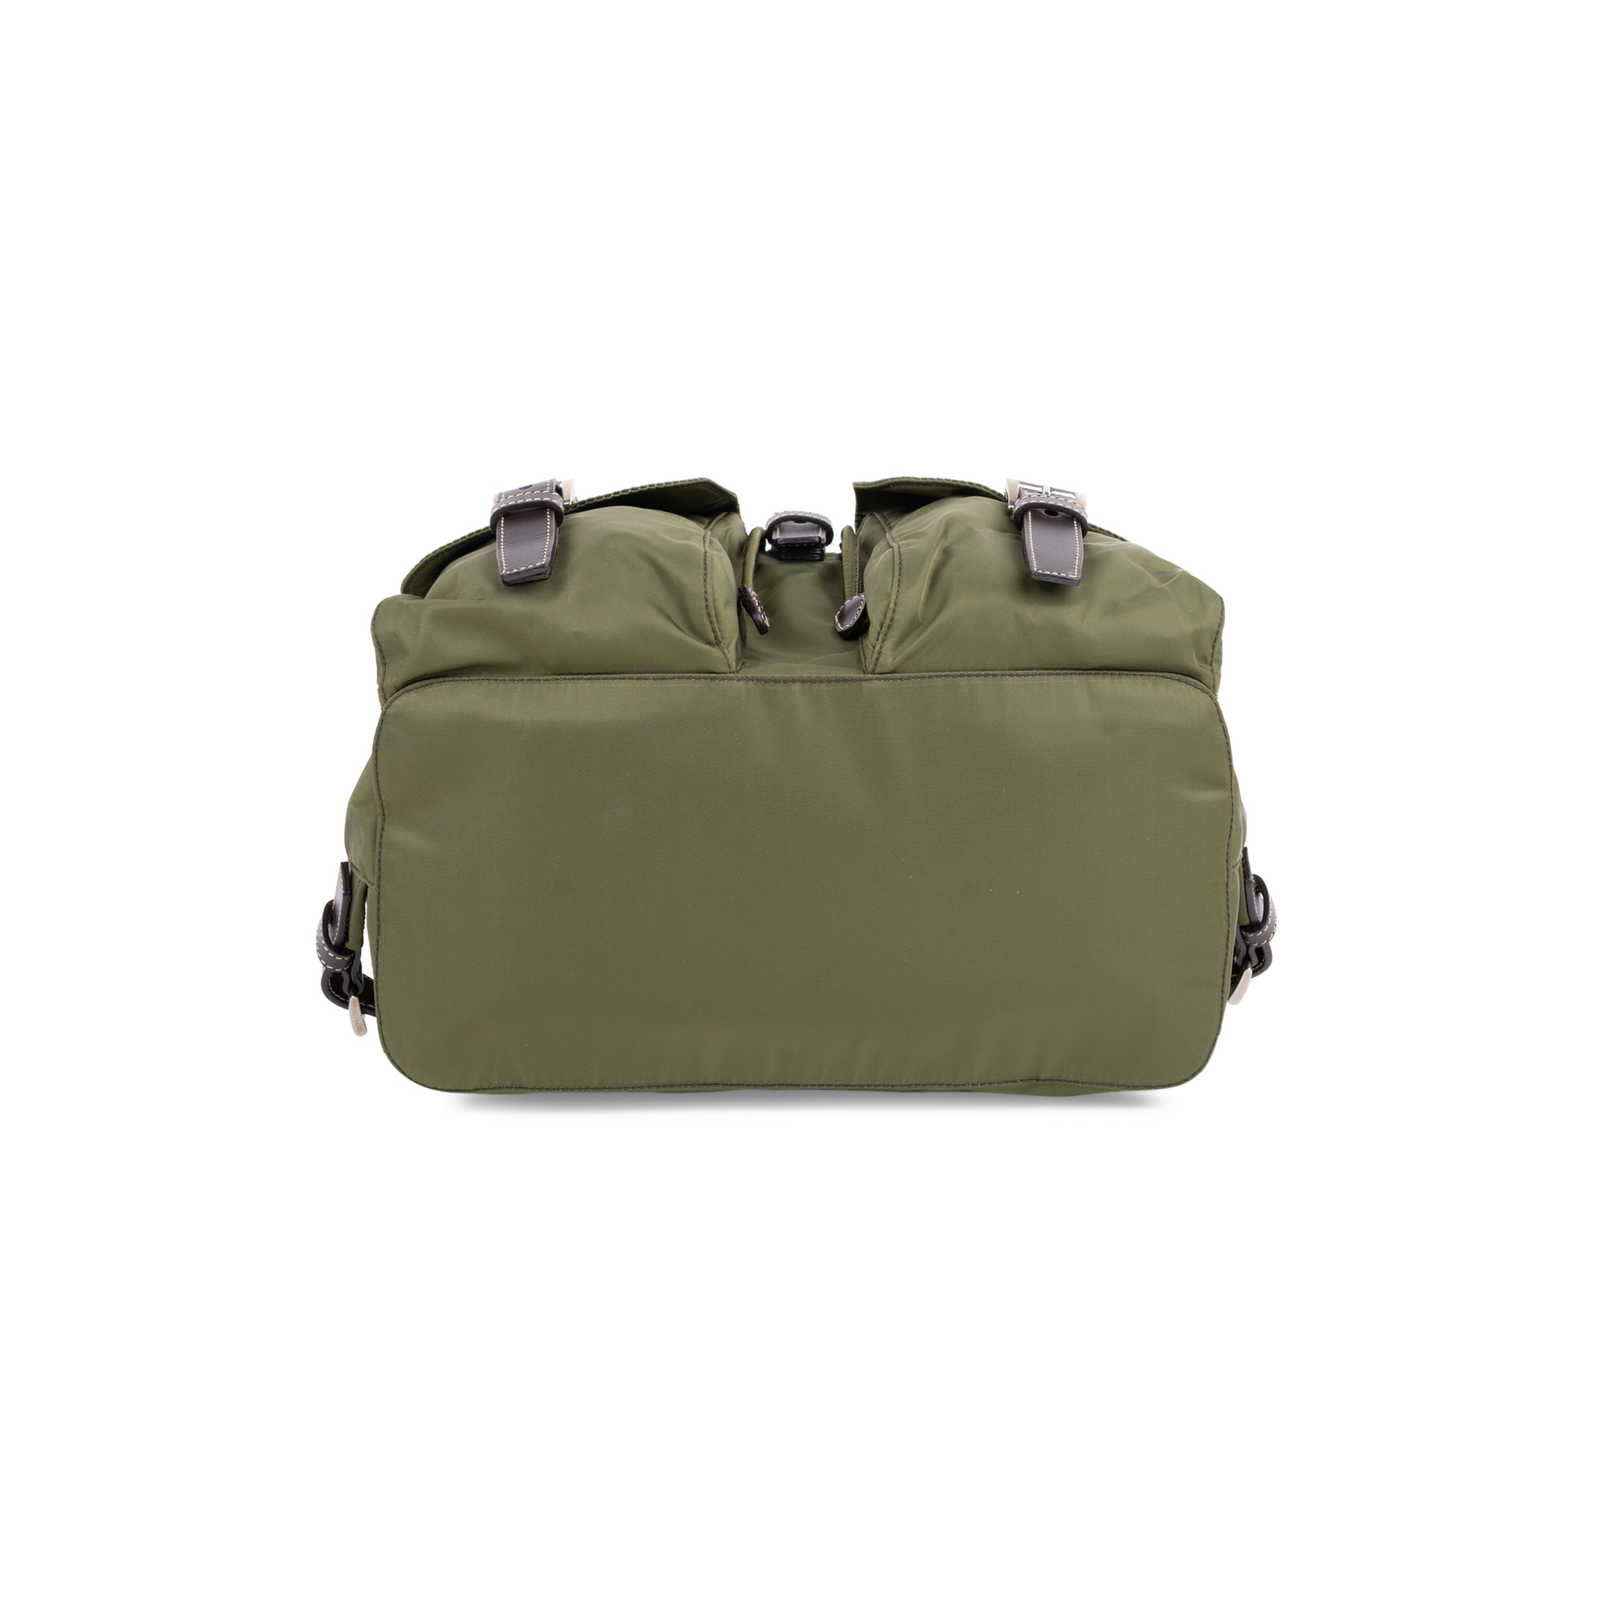 525149aacc11 ... Authentic Second Hand Prada Vela Nylon Backpack (PSS-606-00010) -  Thumbnail ...